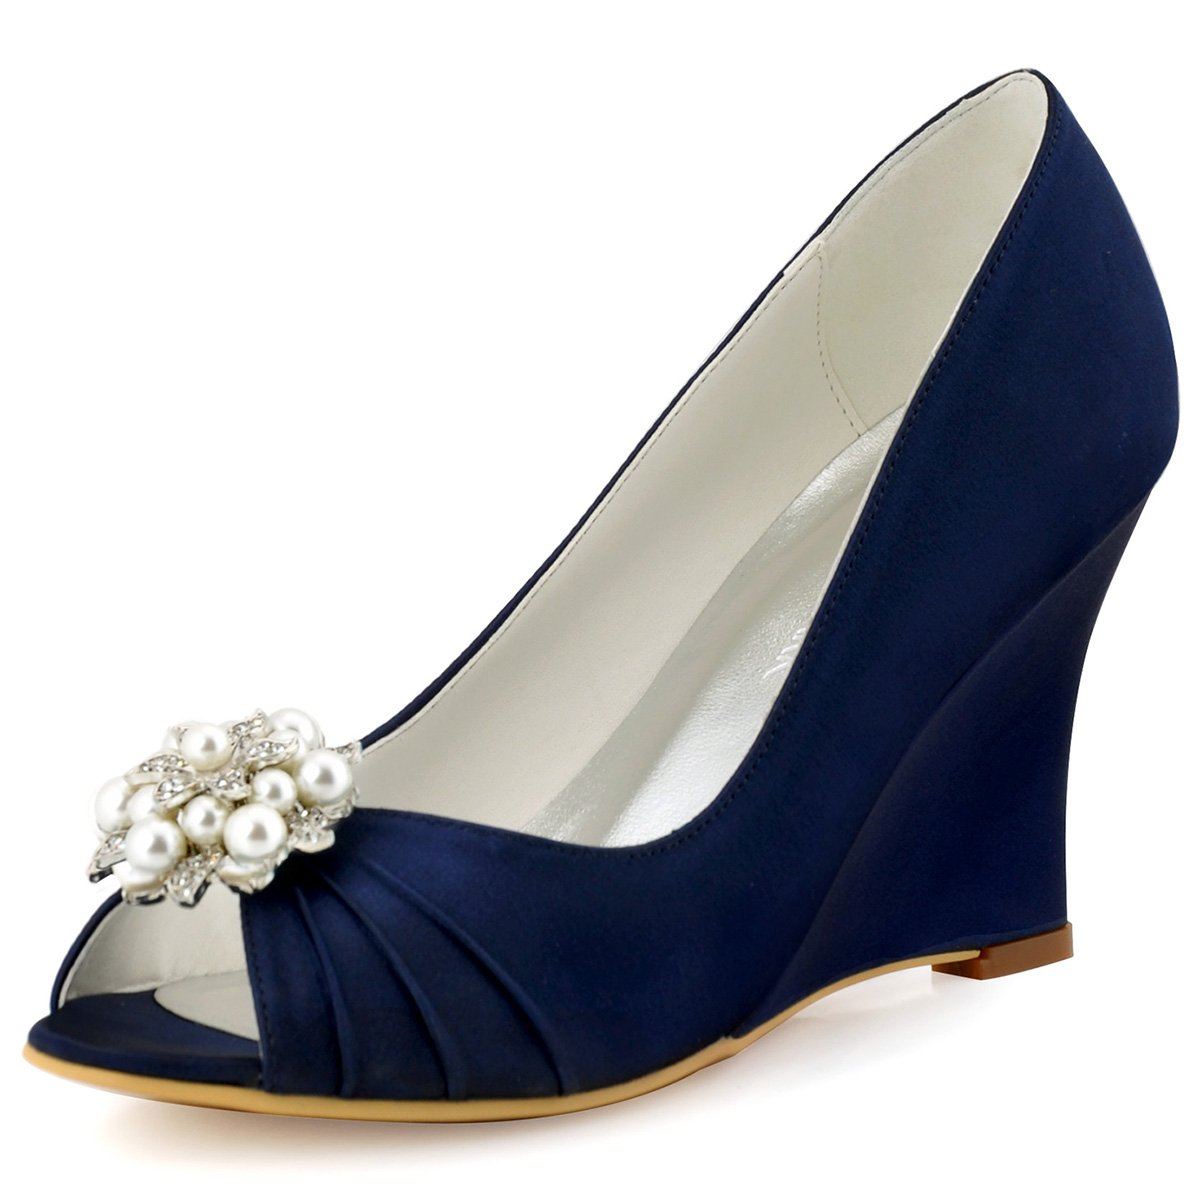 ElegantPark Women High Heel Pumps Peep toe Satin Evening Prom Bridal Wedding Wedges B015MEWYB6 7 B(M) US|Ae01 Navy Blue